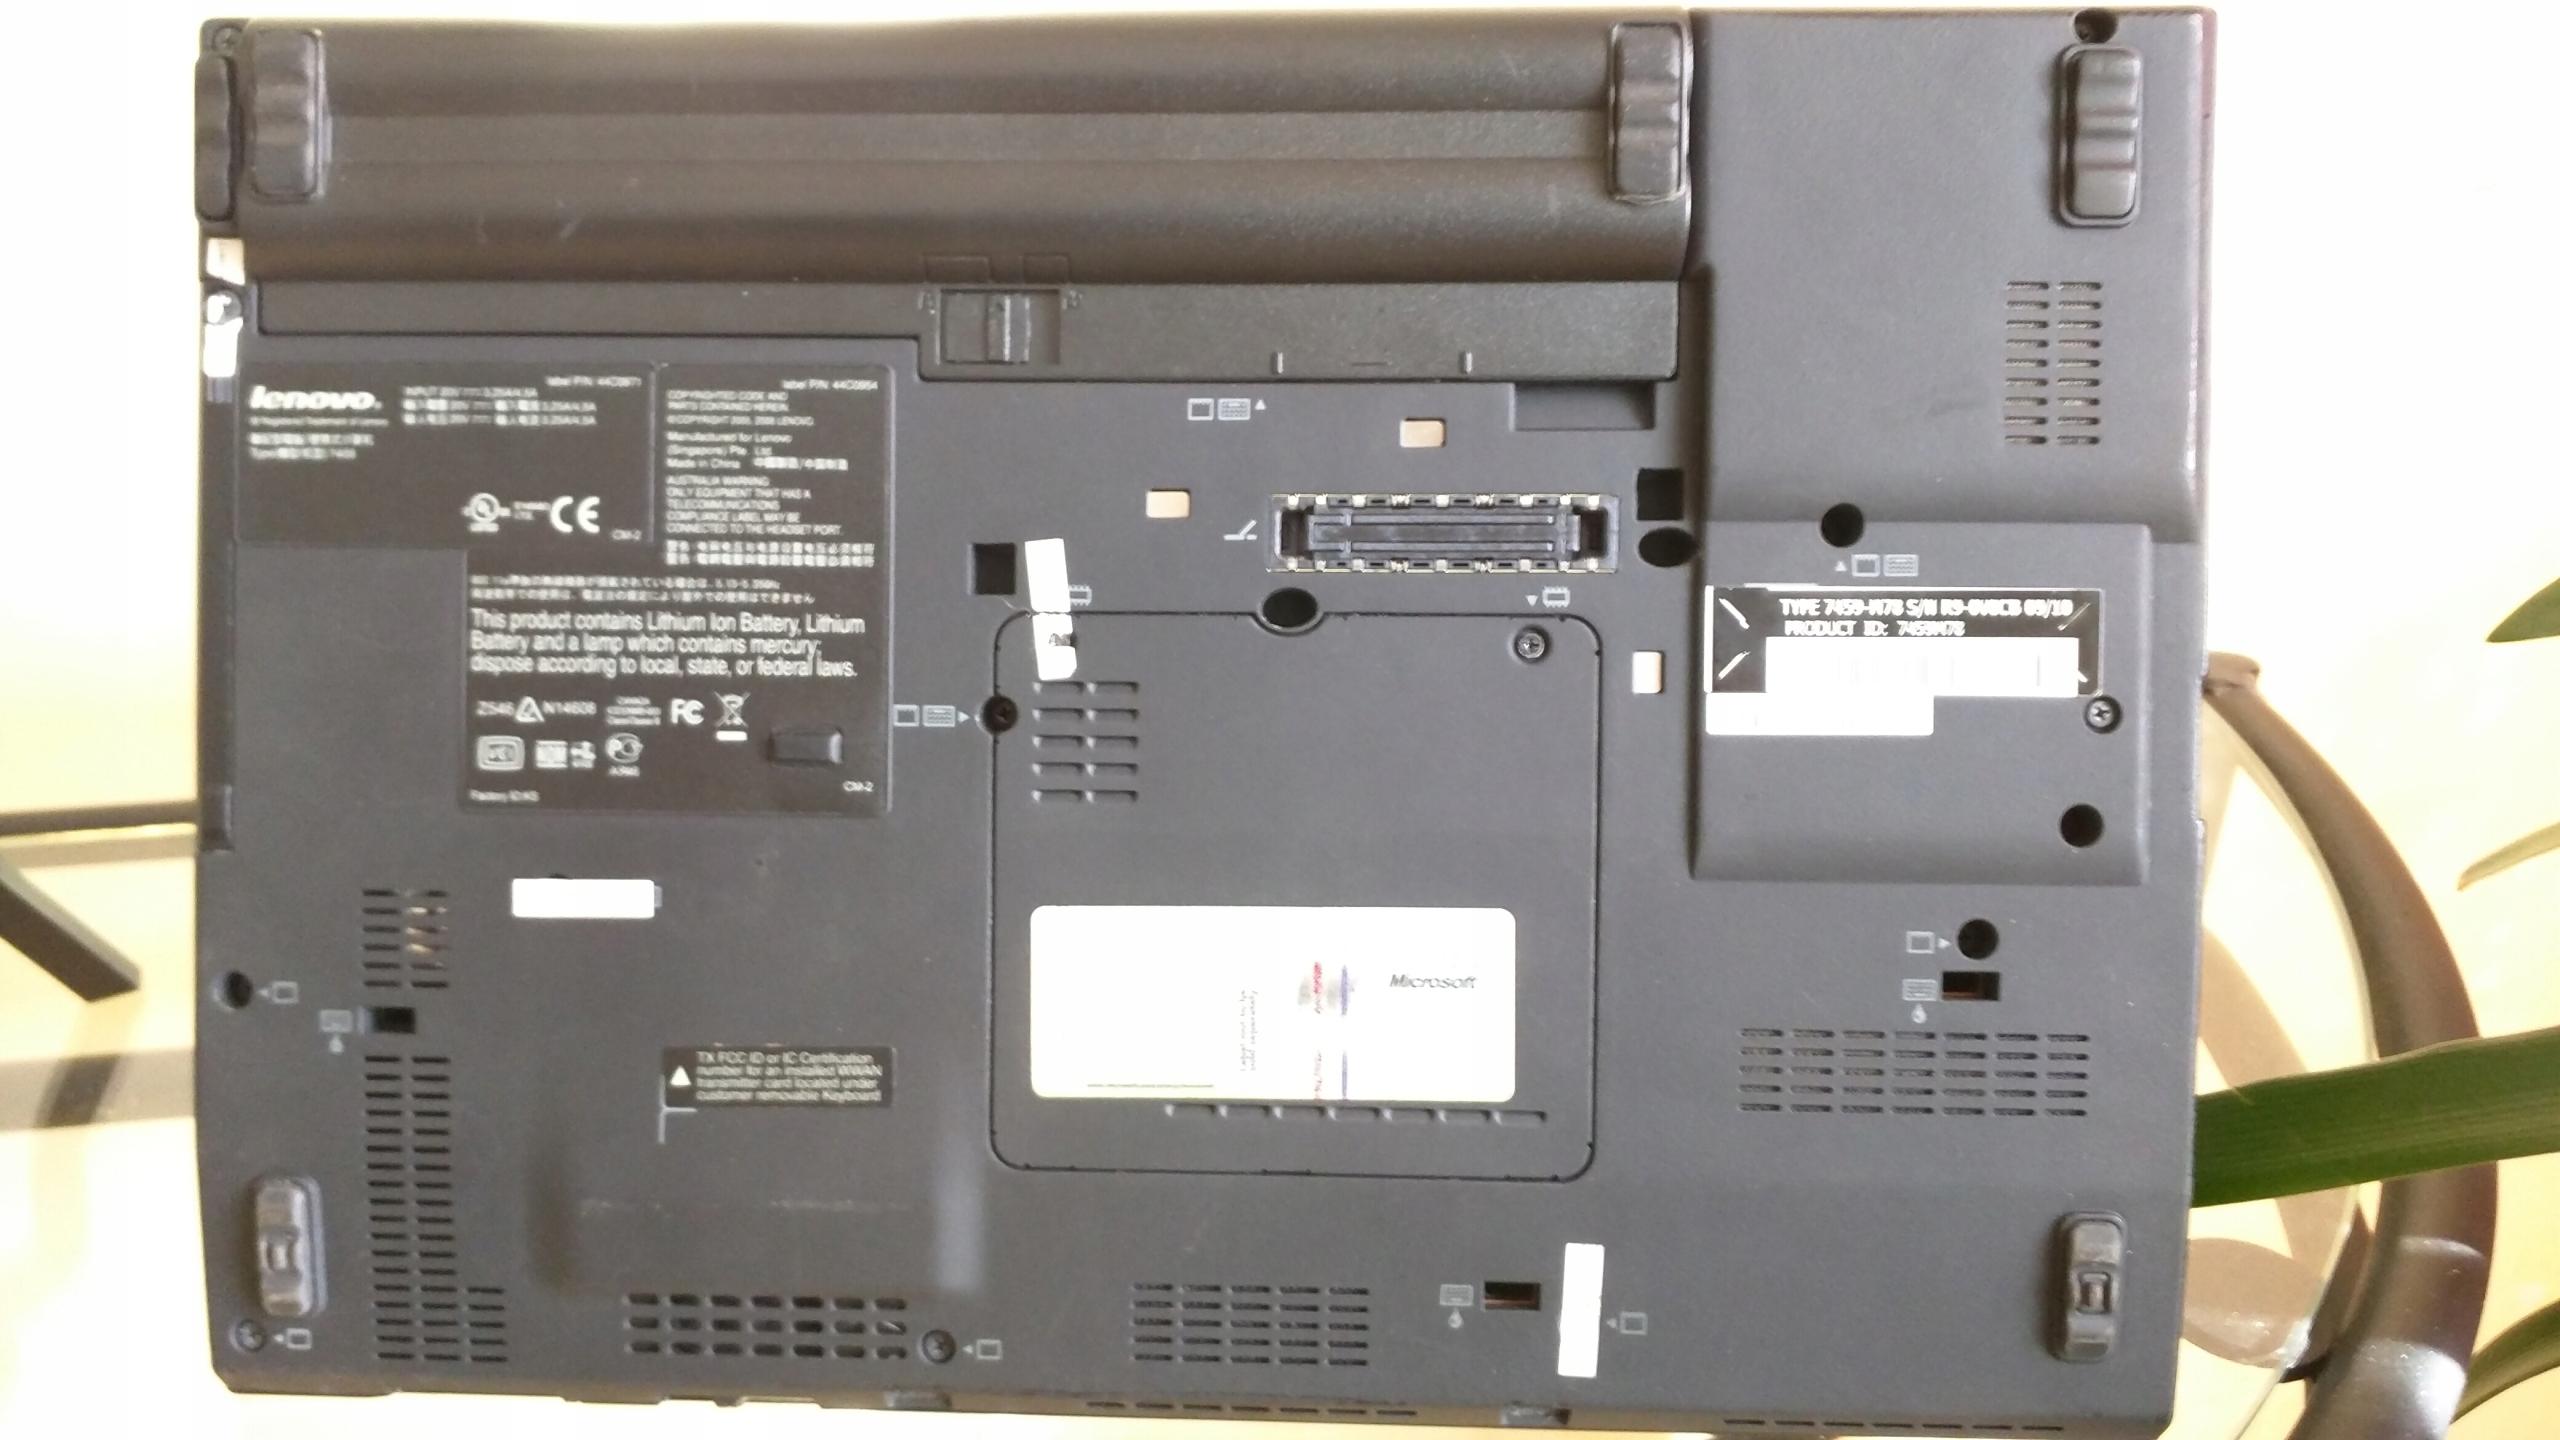 Laptop IBM LENOVO X 200 system LINUX Mint 18 1 - 7951873798